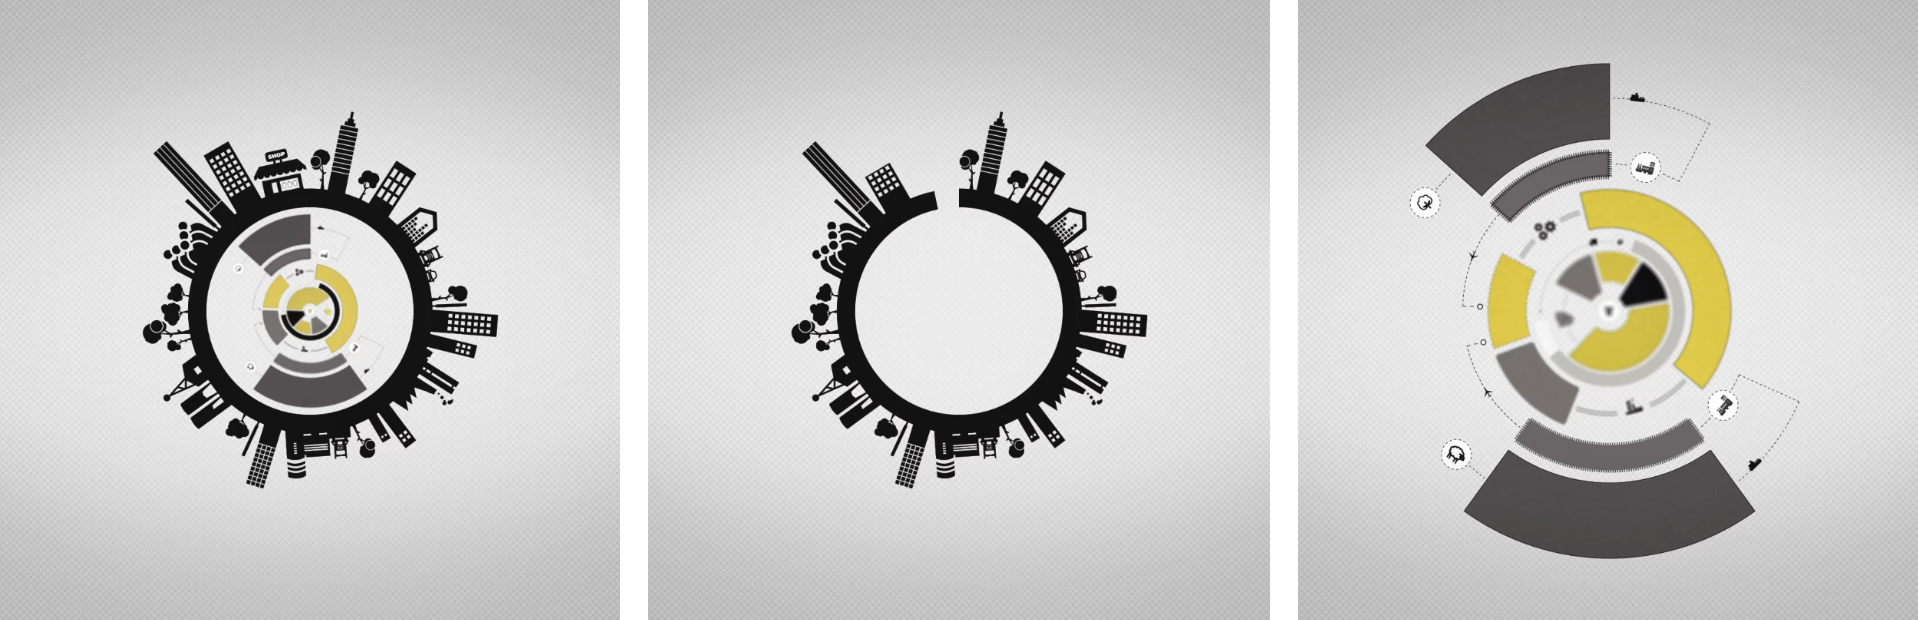 Smartchain+Agility+by+design+bonjourmolotov+11.png